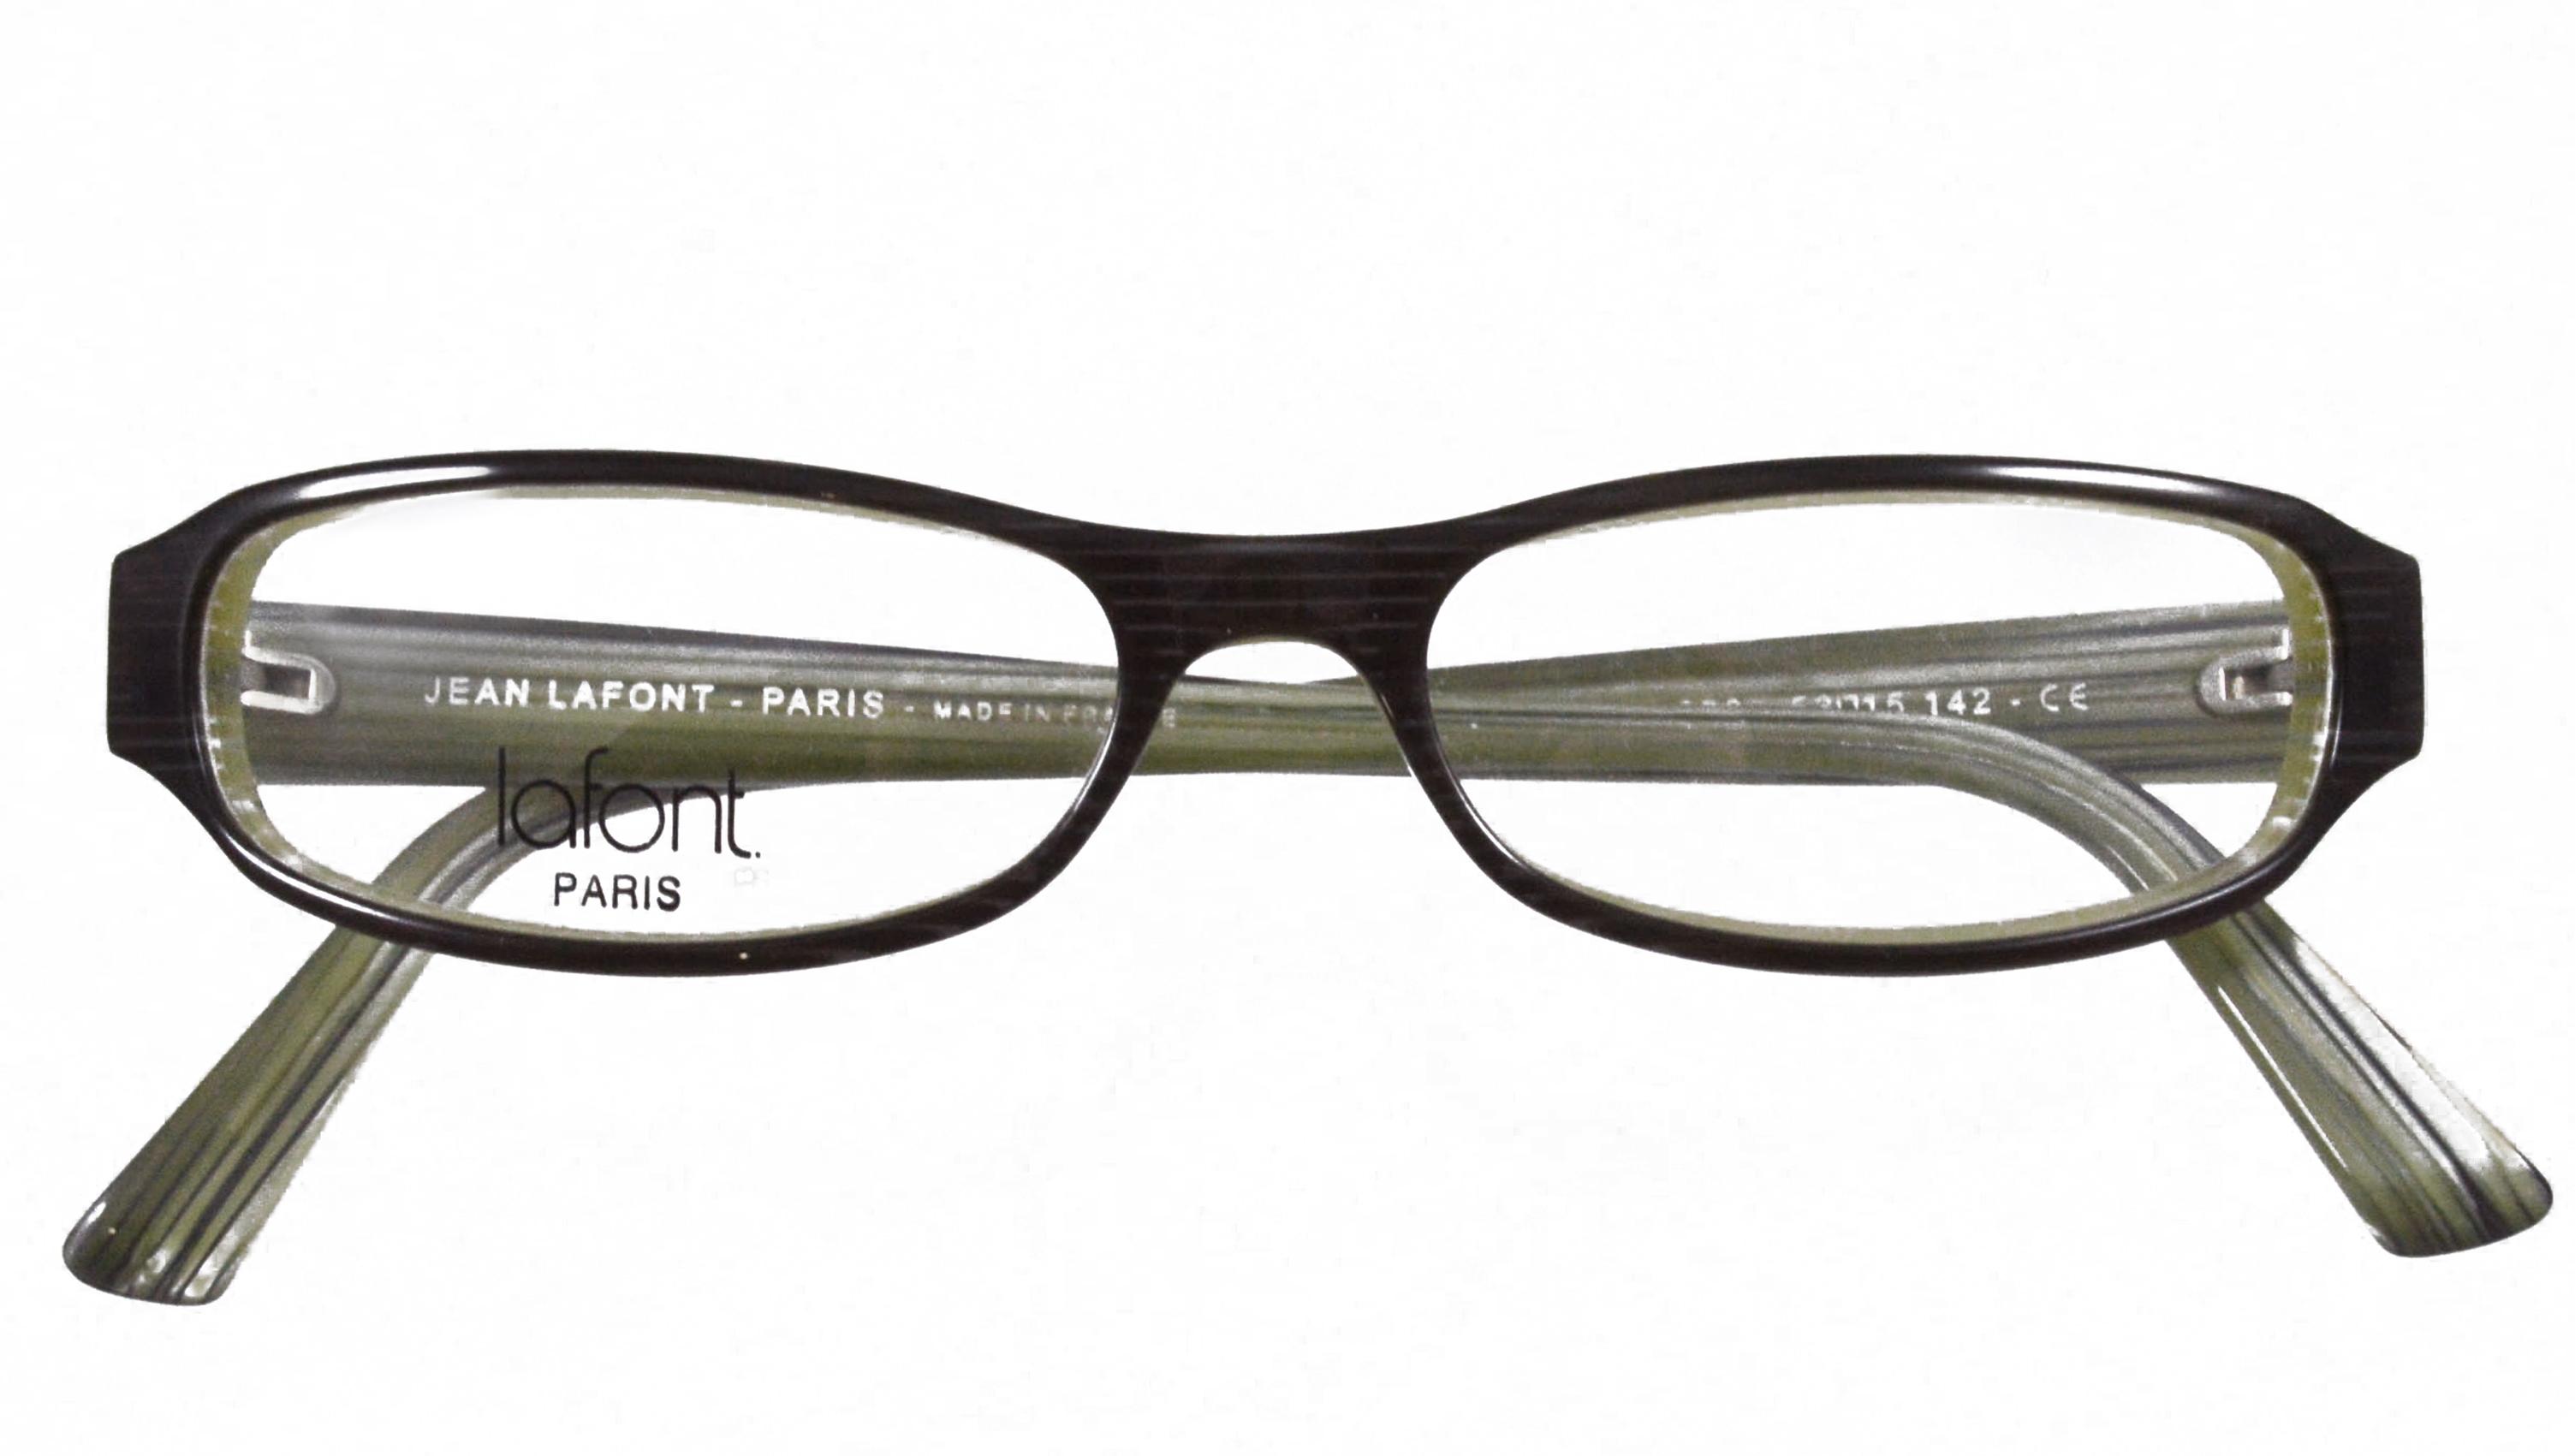 5f03fda9562 Eyeglasses  Brand Lafont Lifetime-Eyecare.com has the most ...